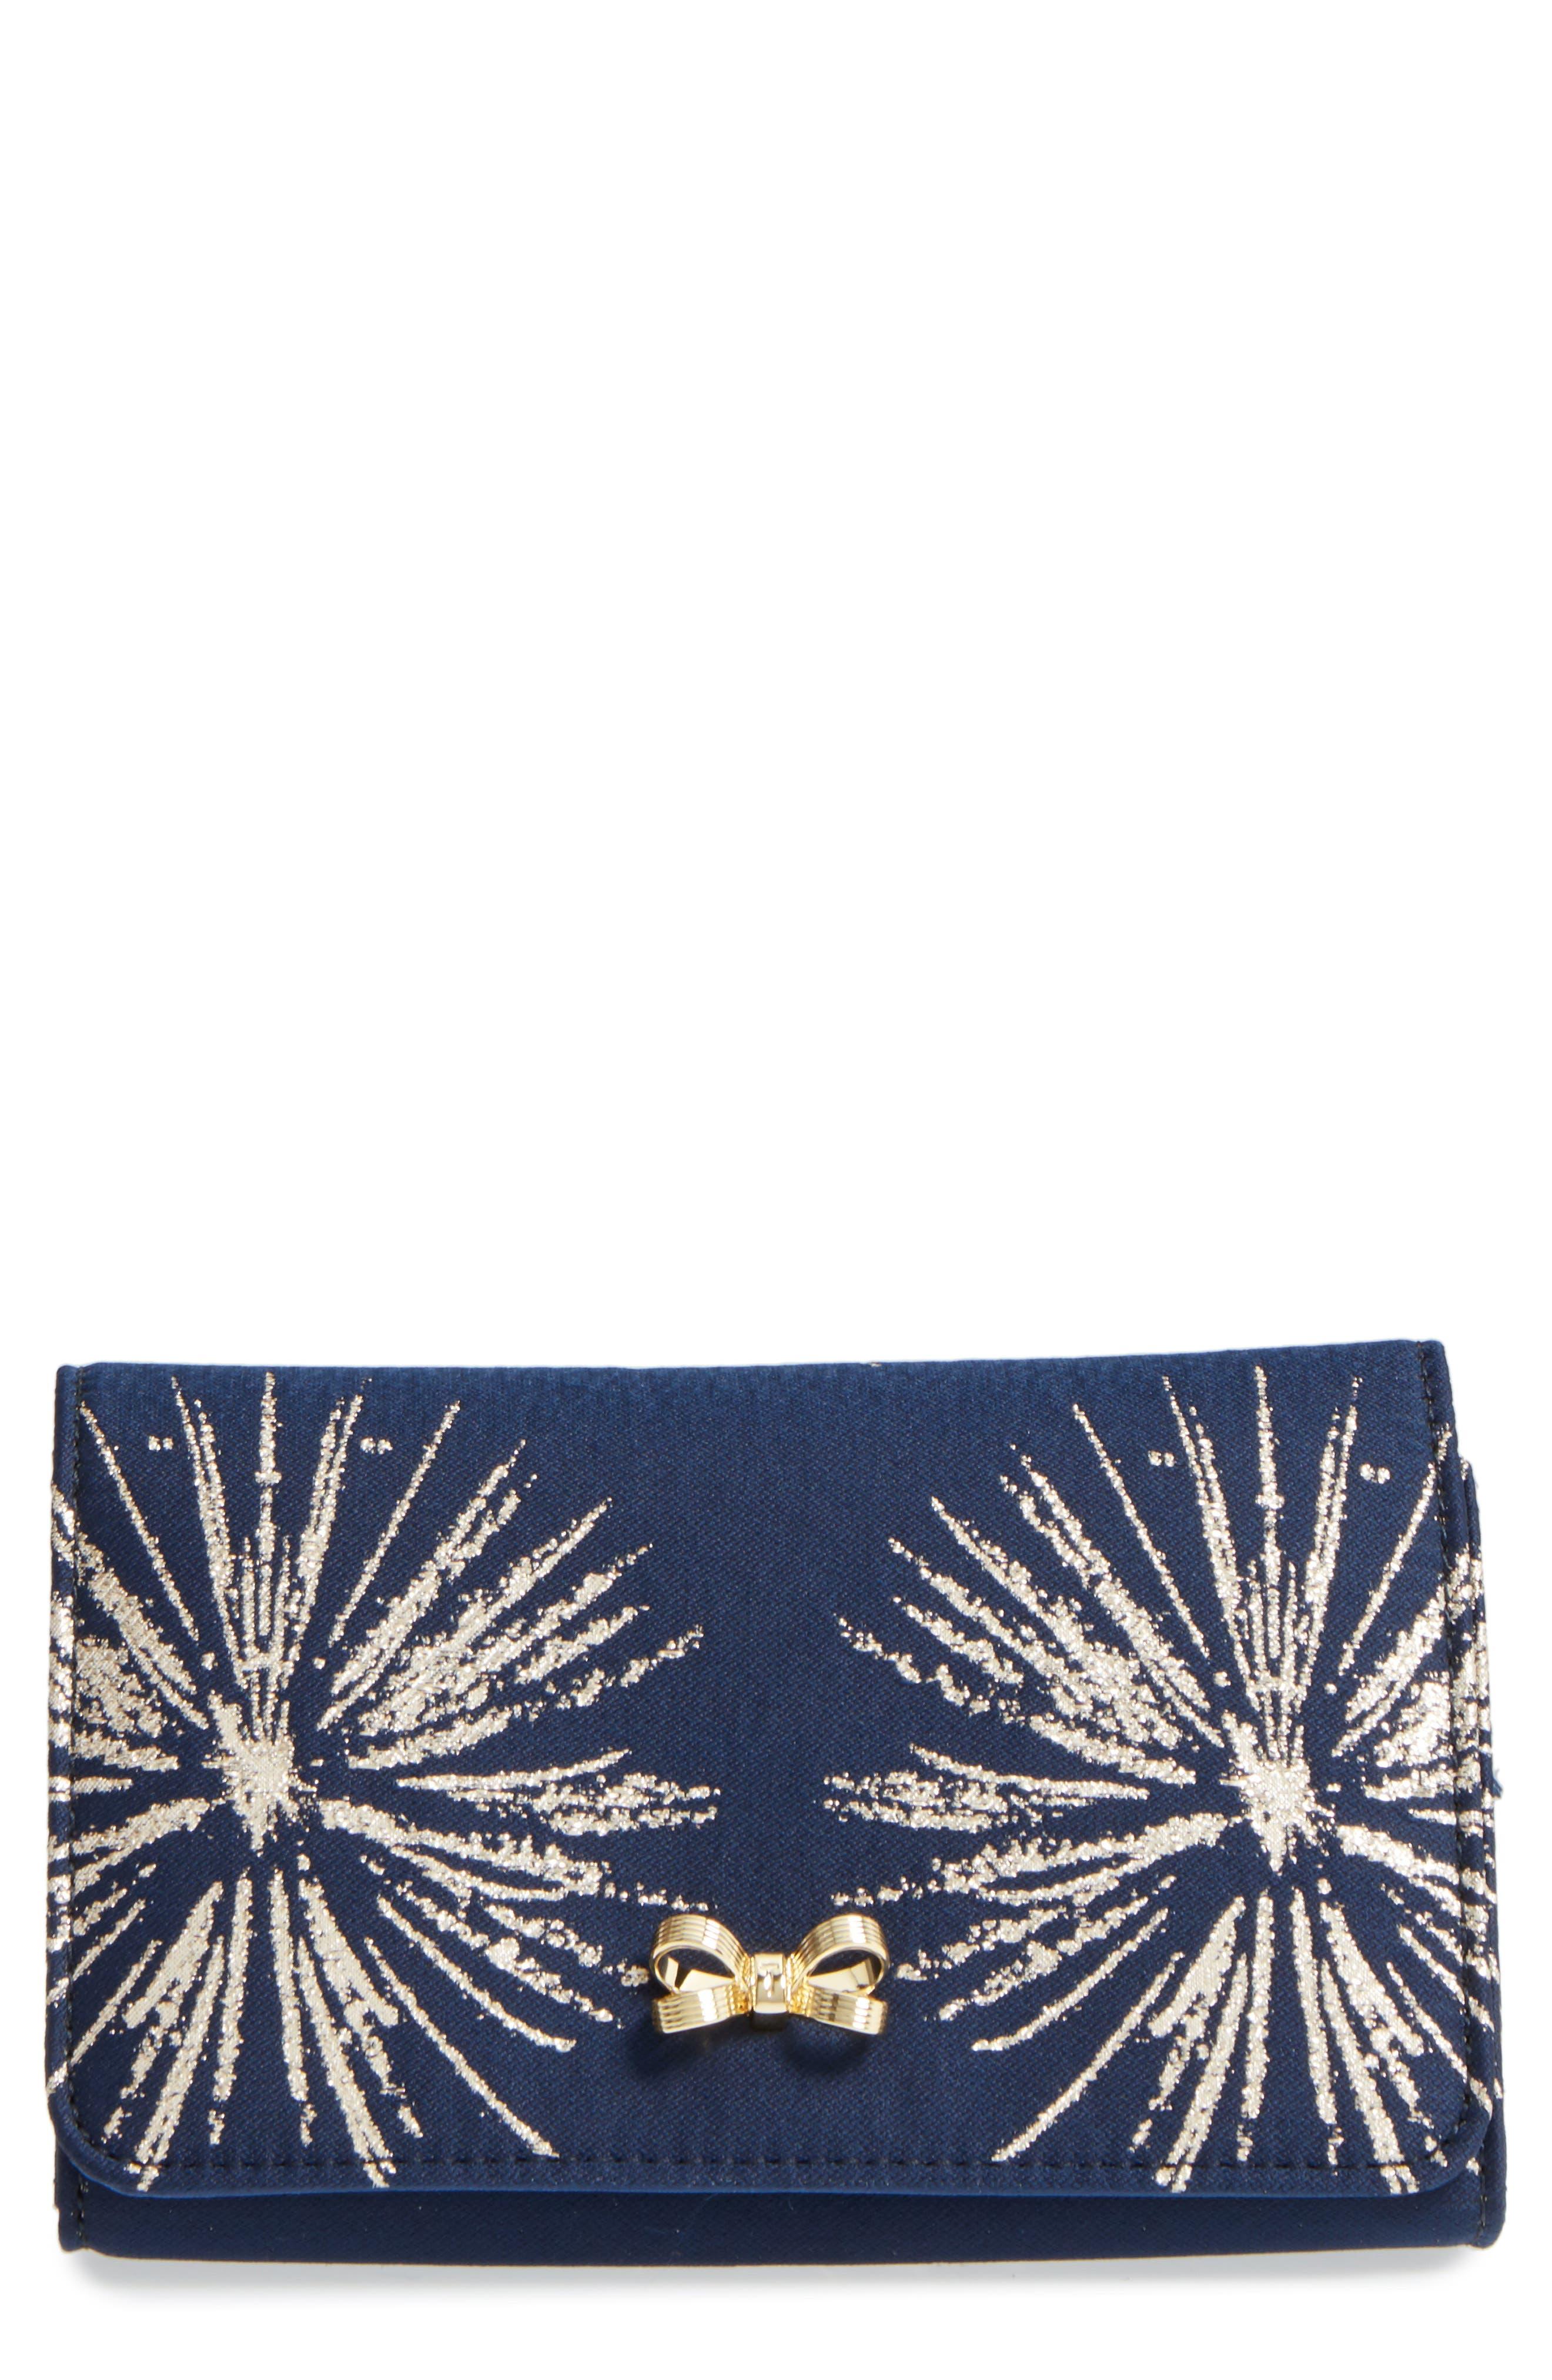 Starla Stardust Bow Clutch,                             Main thumbnail 1, color,                             Dark Blue